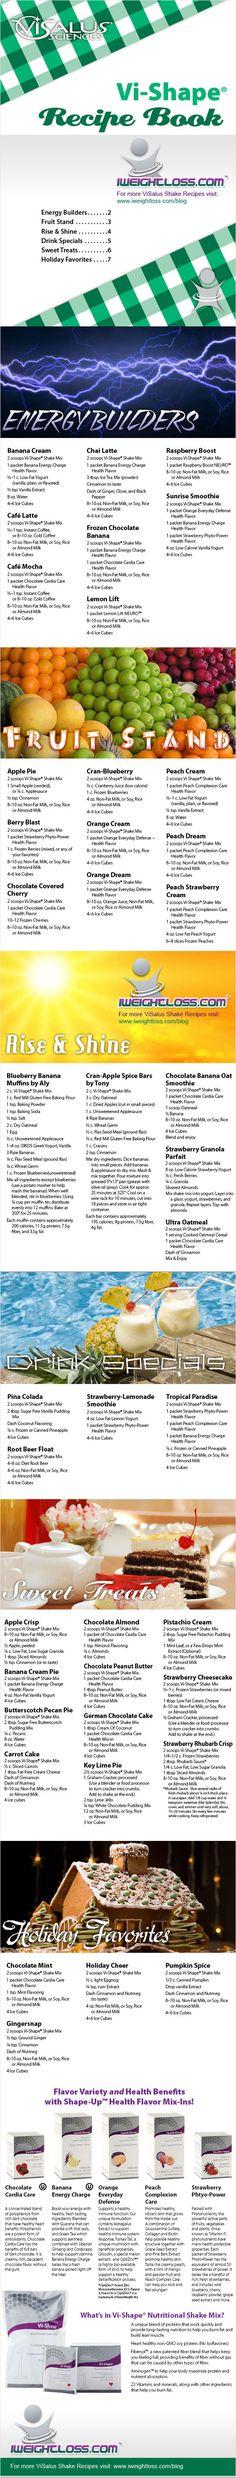 ViSalus Shakes Recipe Book   ViSalus Body by Vi™ News and Updates